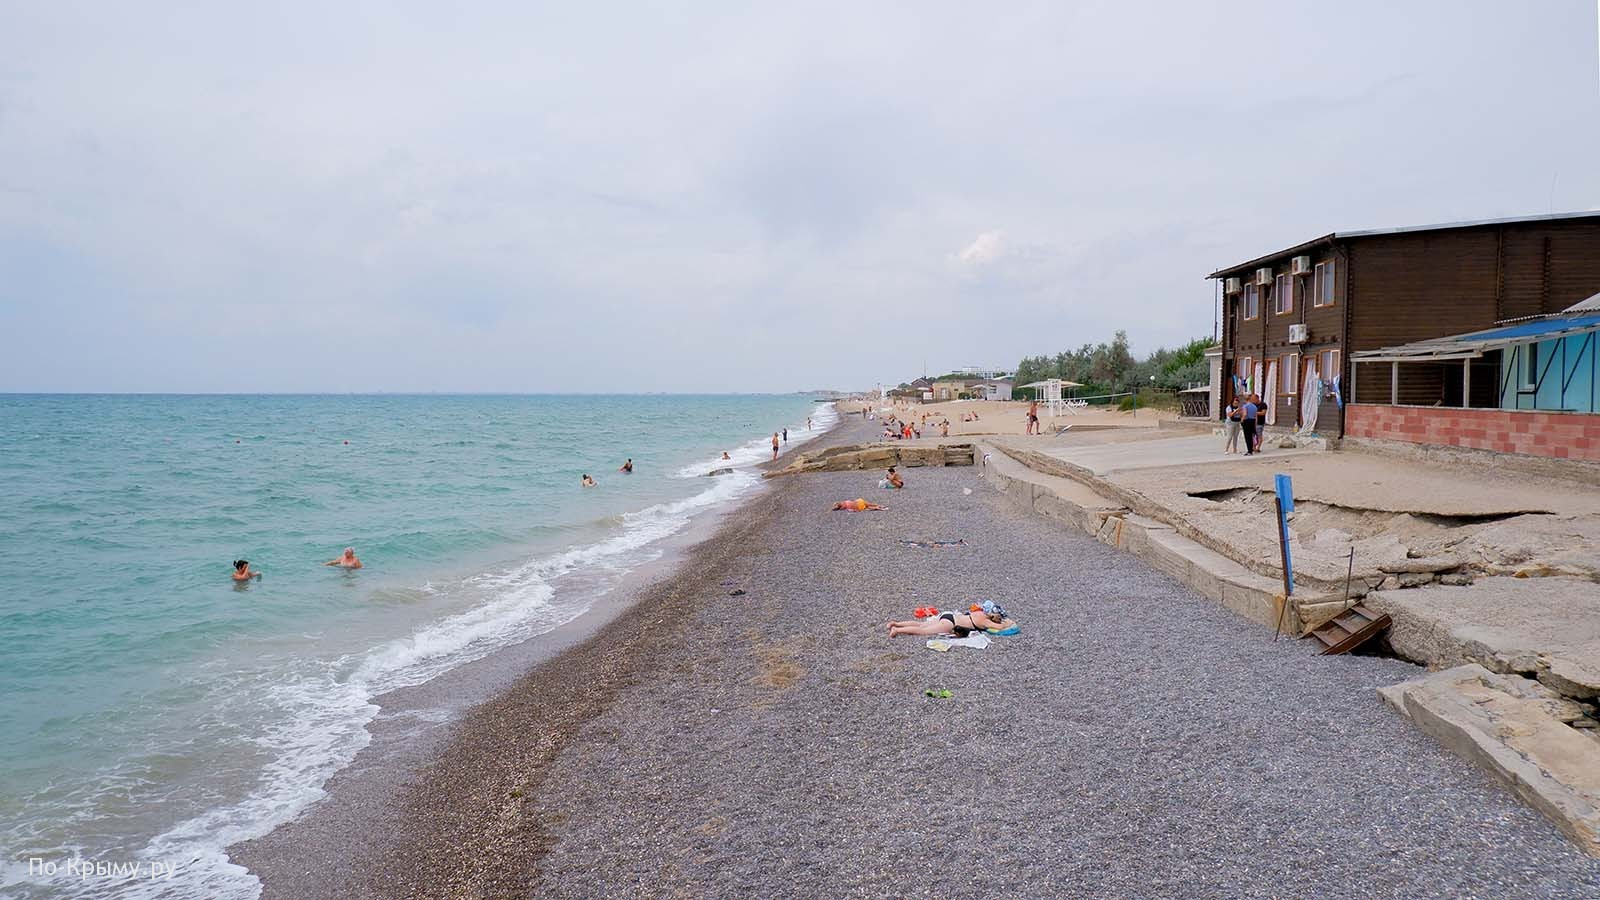 Пляж Rest Royally СА-03, Саки, Крым